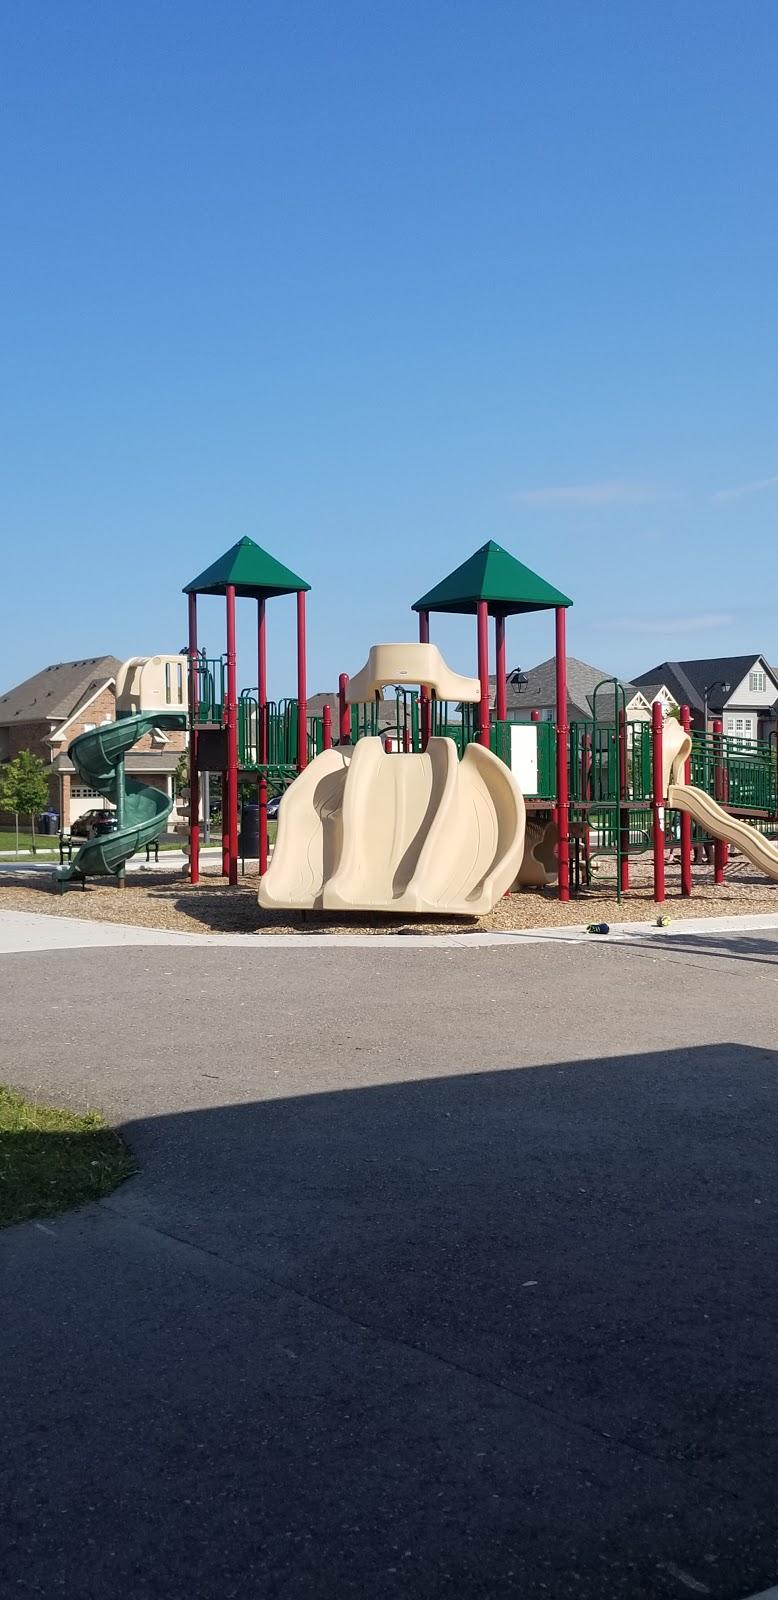 Bonnieglen Farm Park   park   28 Twistleton St, Caledon, ON L7C 3V9 Twistleton St, Caledon, ON L7C 3V9, Canada